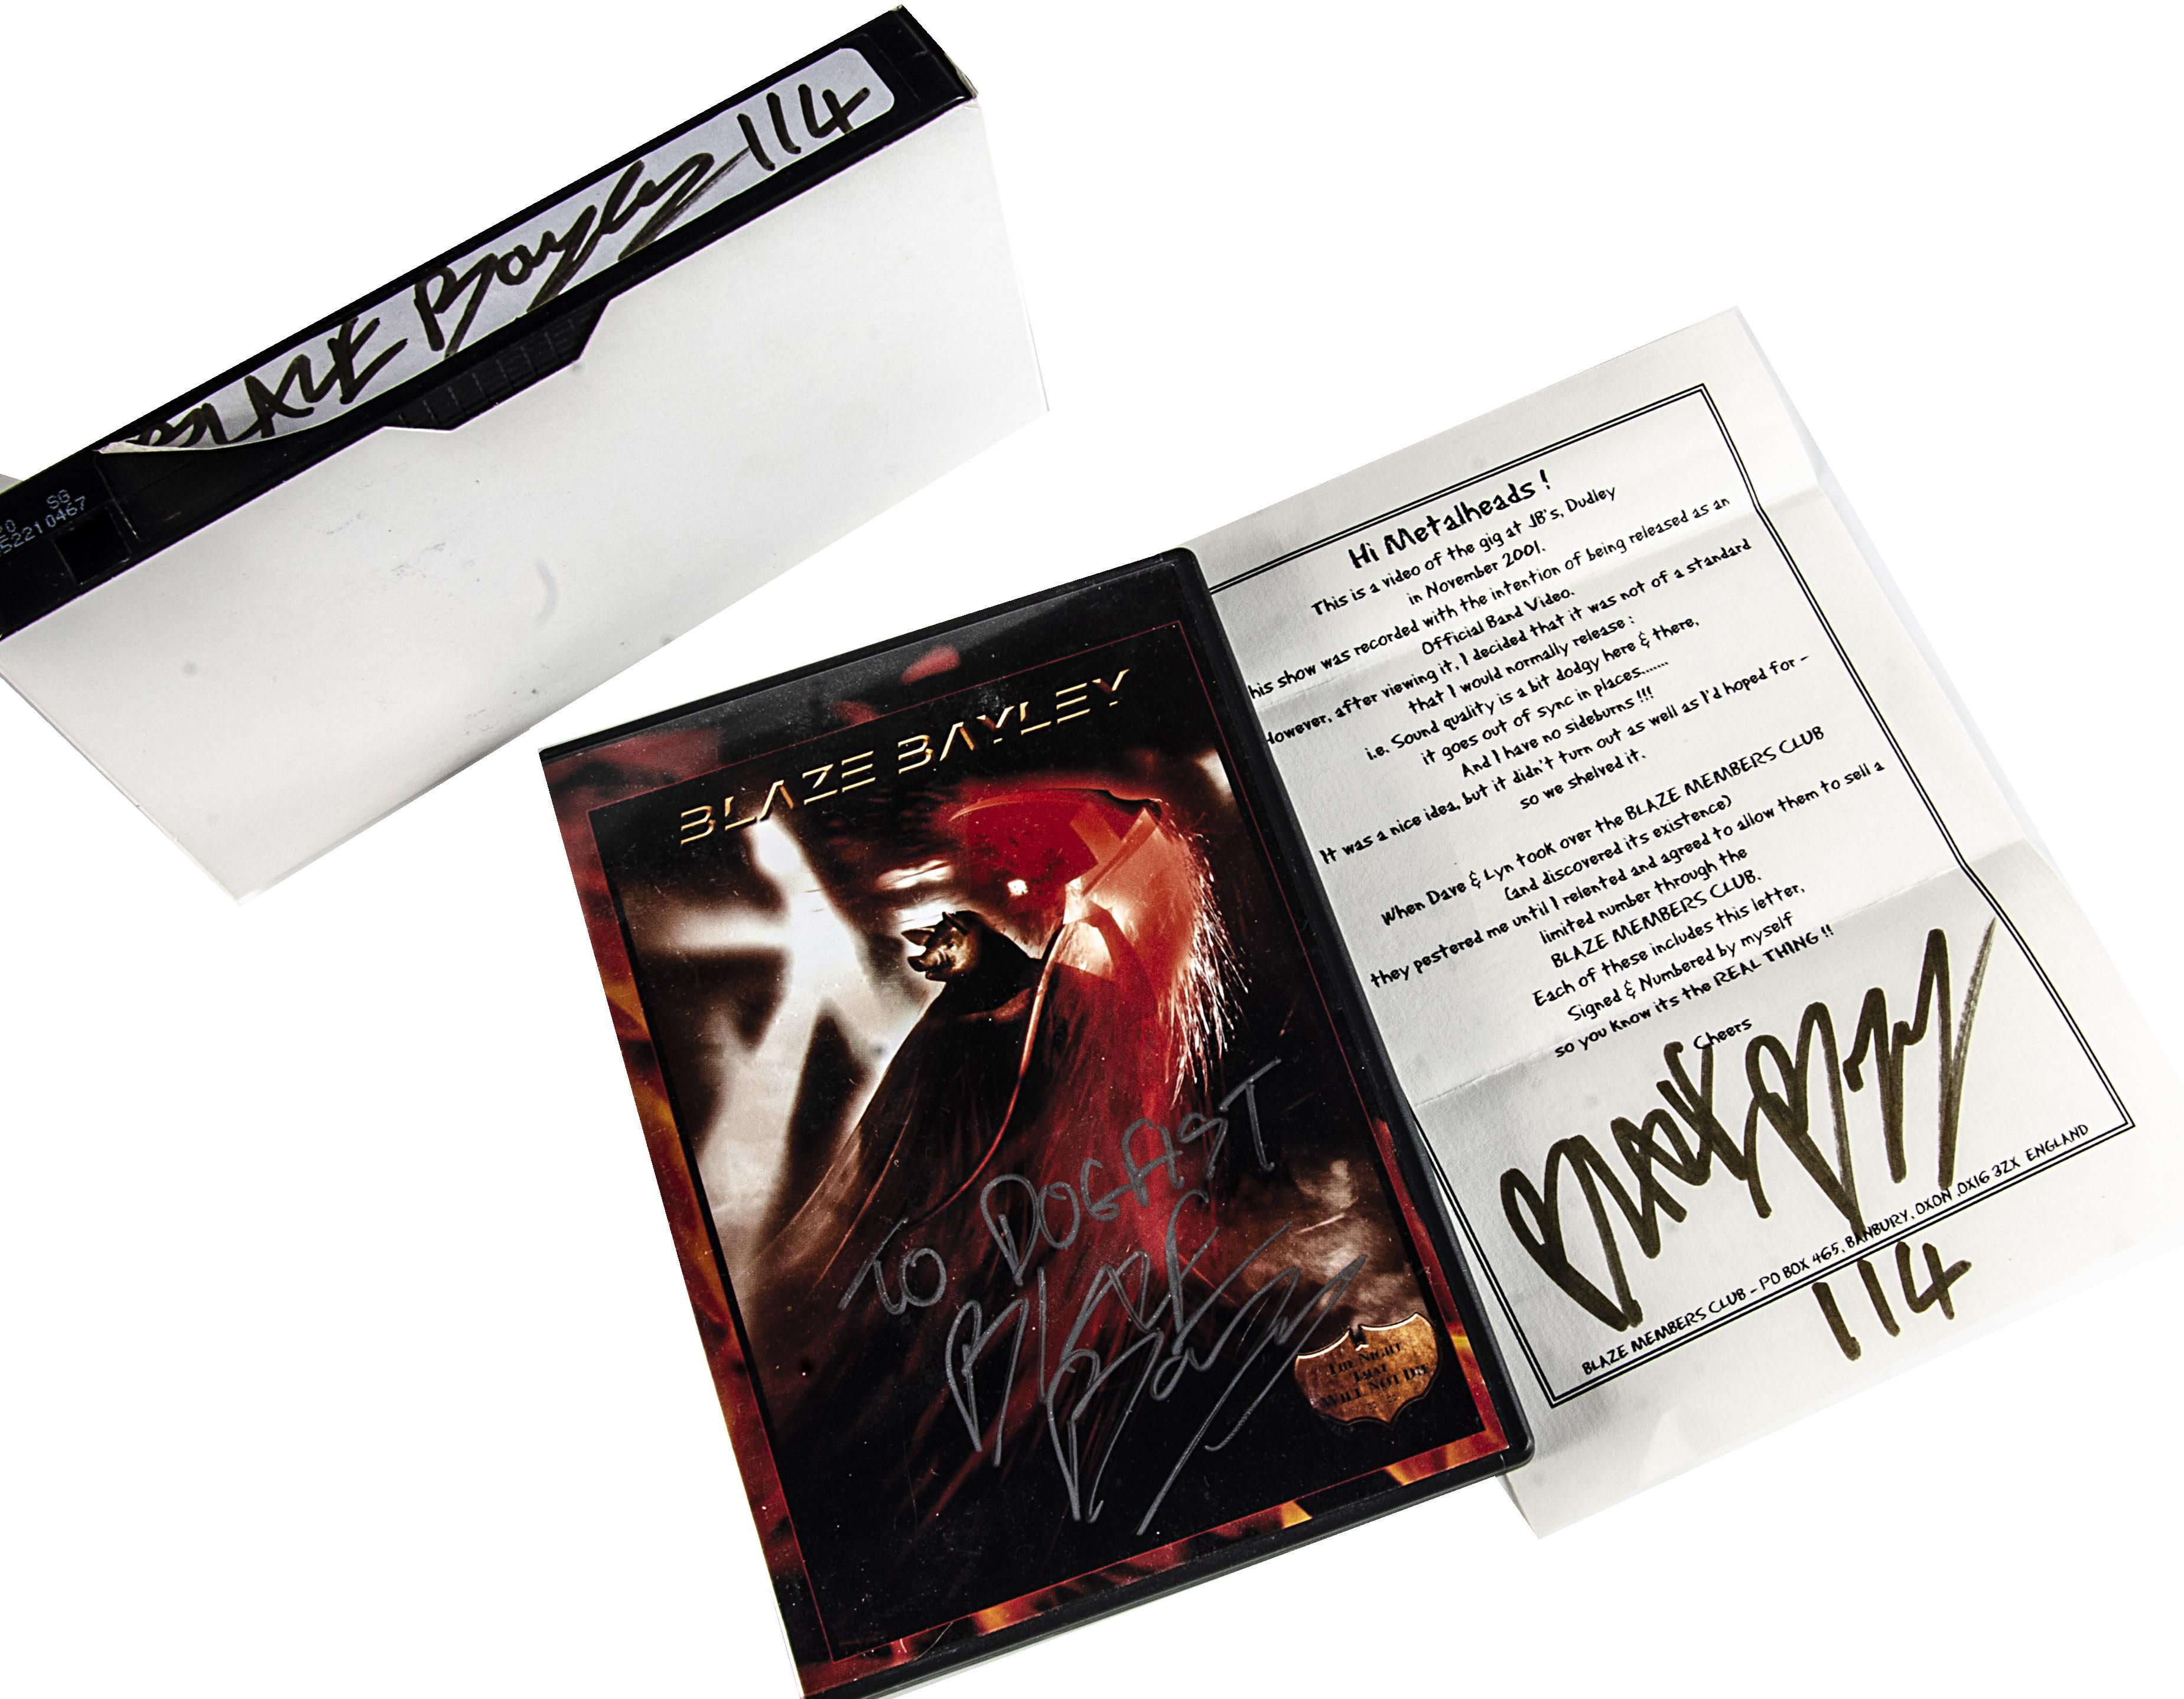 Blaze Bayley Signed Video and DVD, Blaze Live at JBs 16 Nov 2001 - Limited Edition Video for the